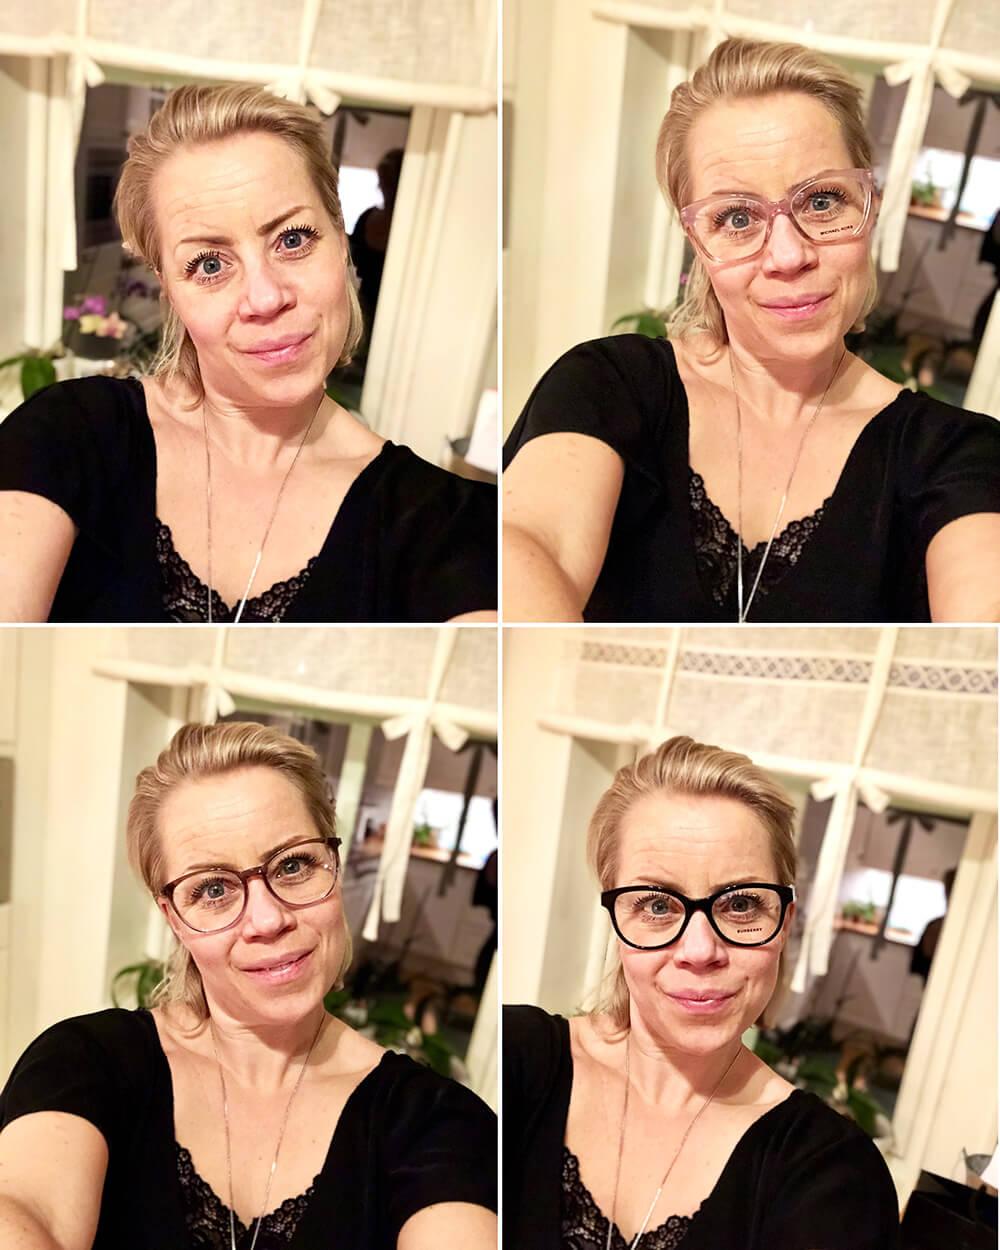 Karin Axelsson nya glasögon